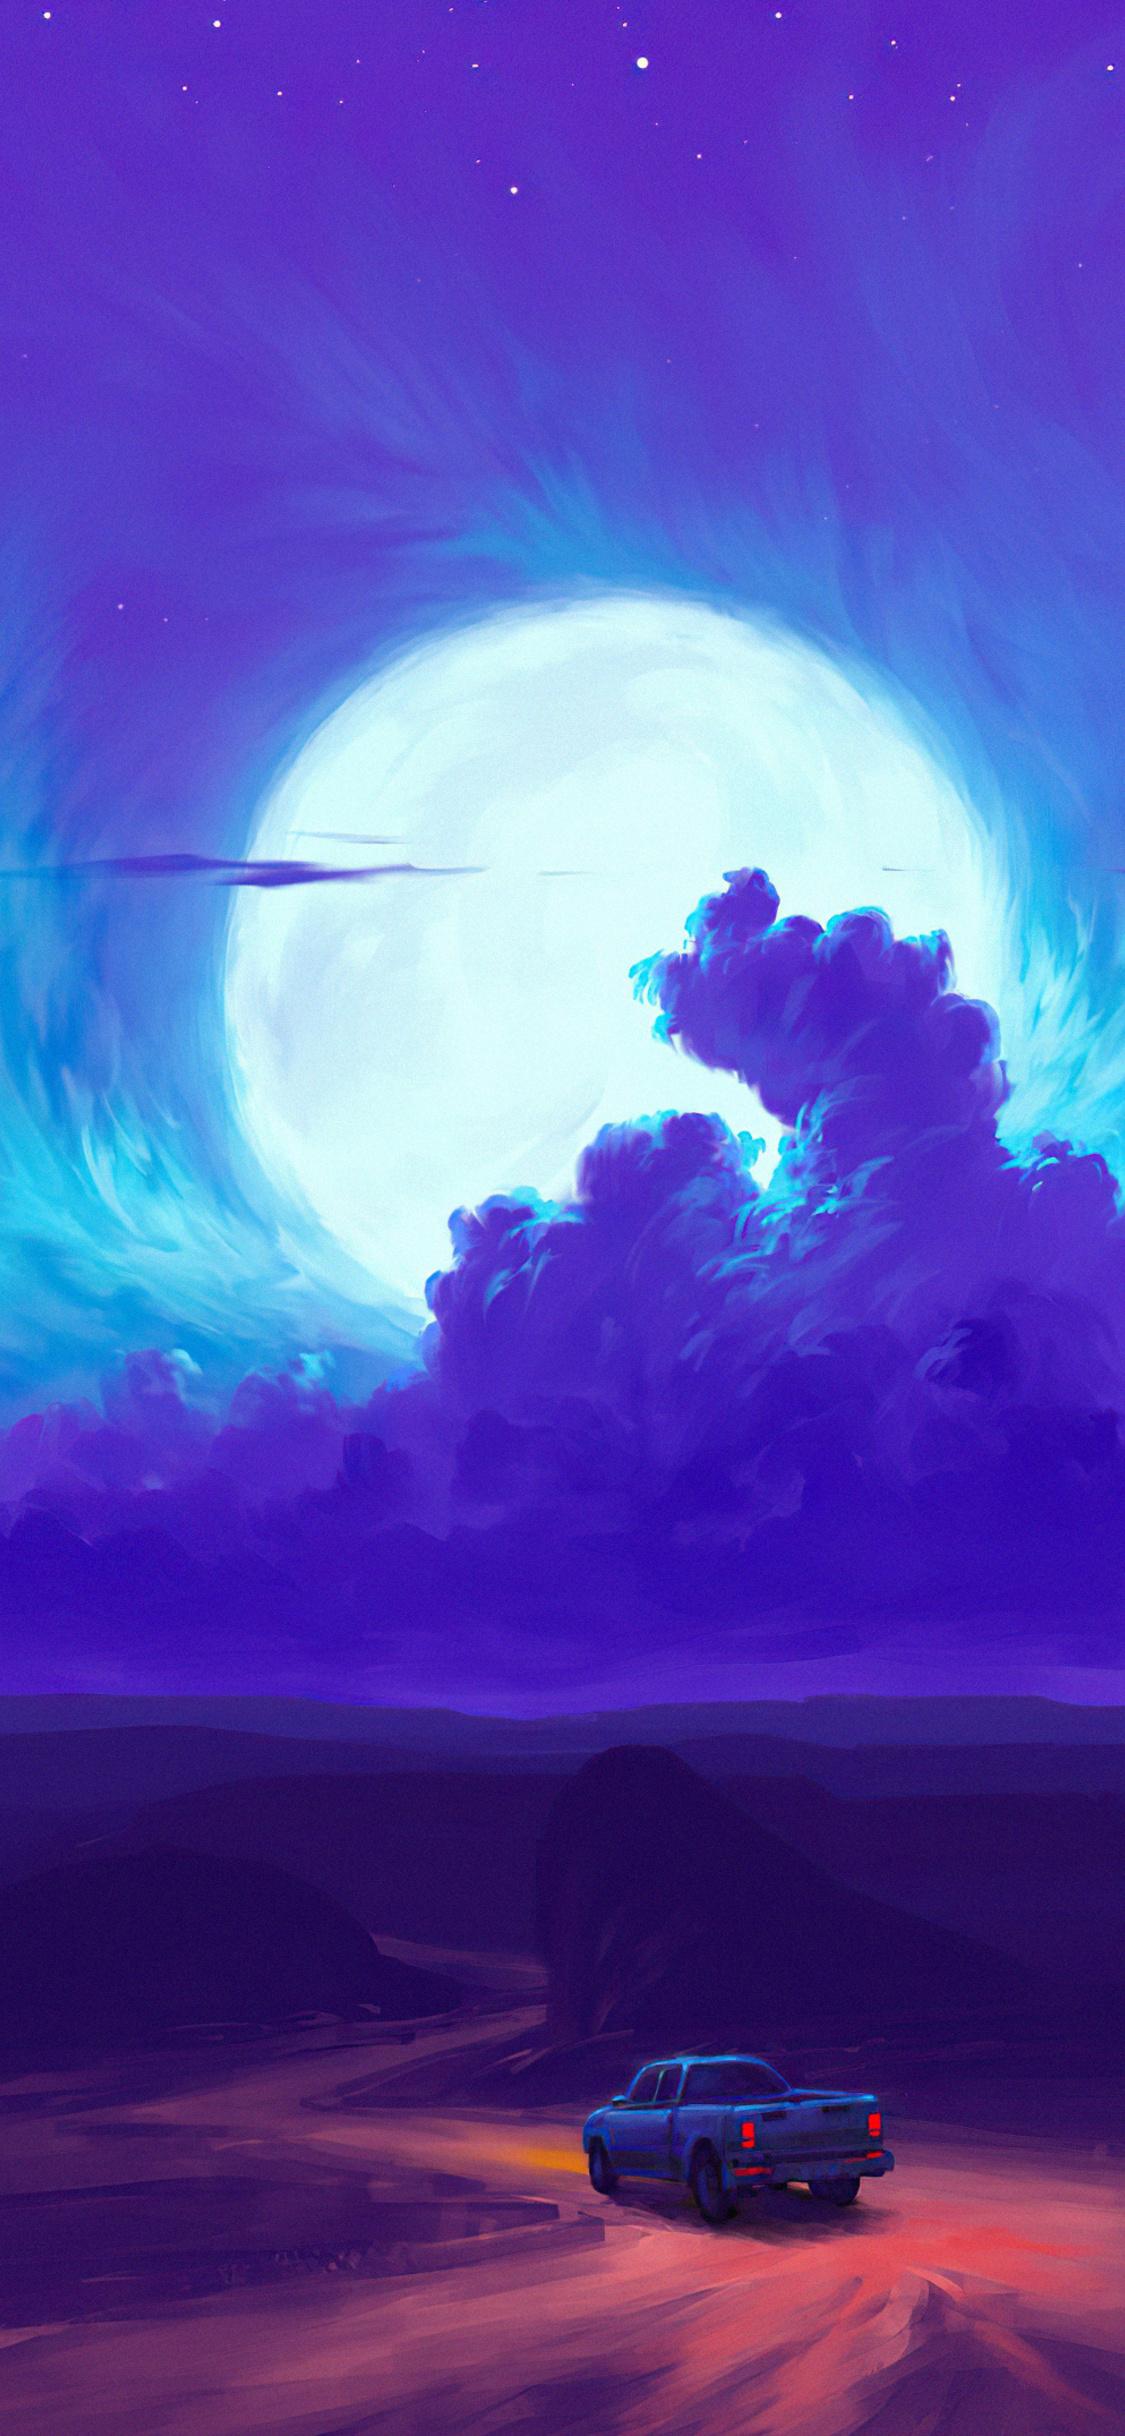 moonrise-minimal-4k-1i.jpg